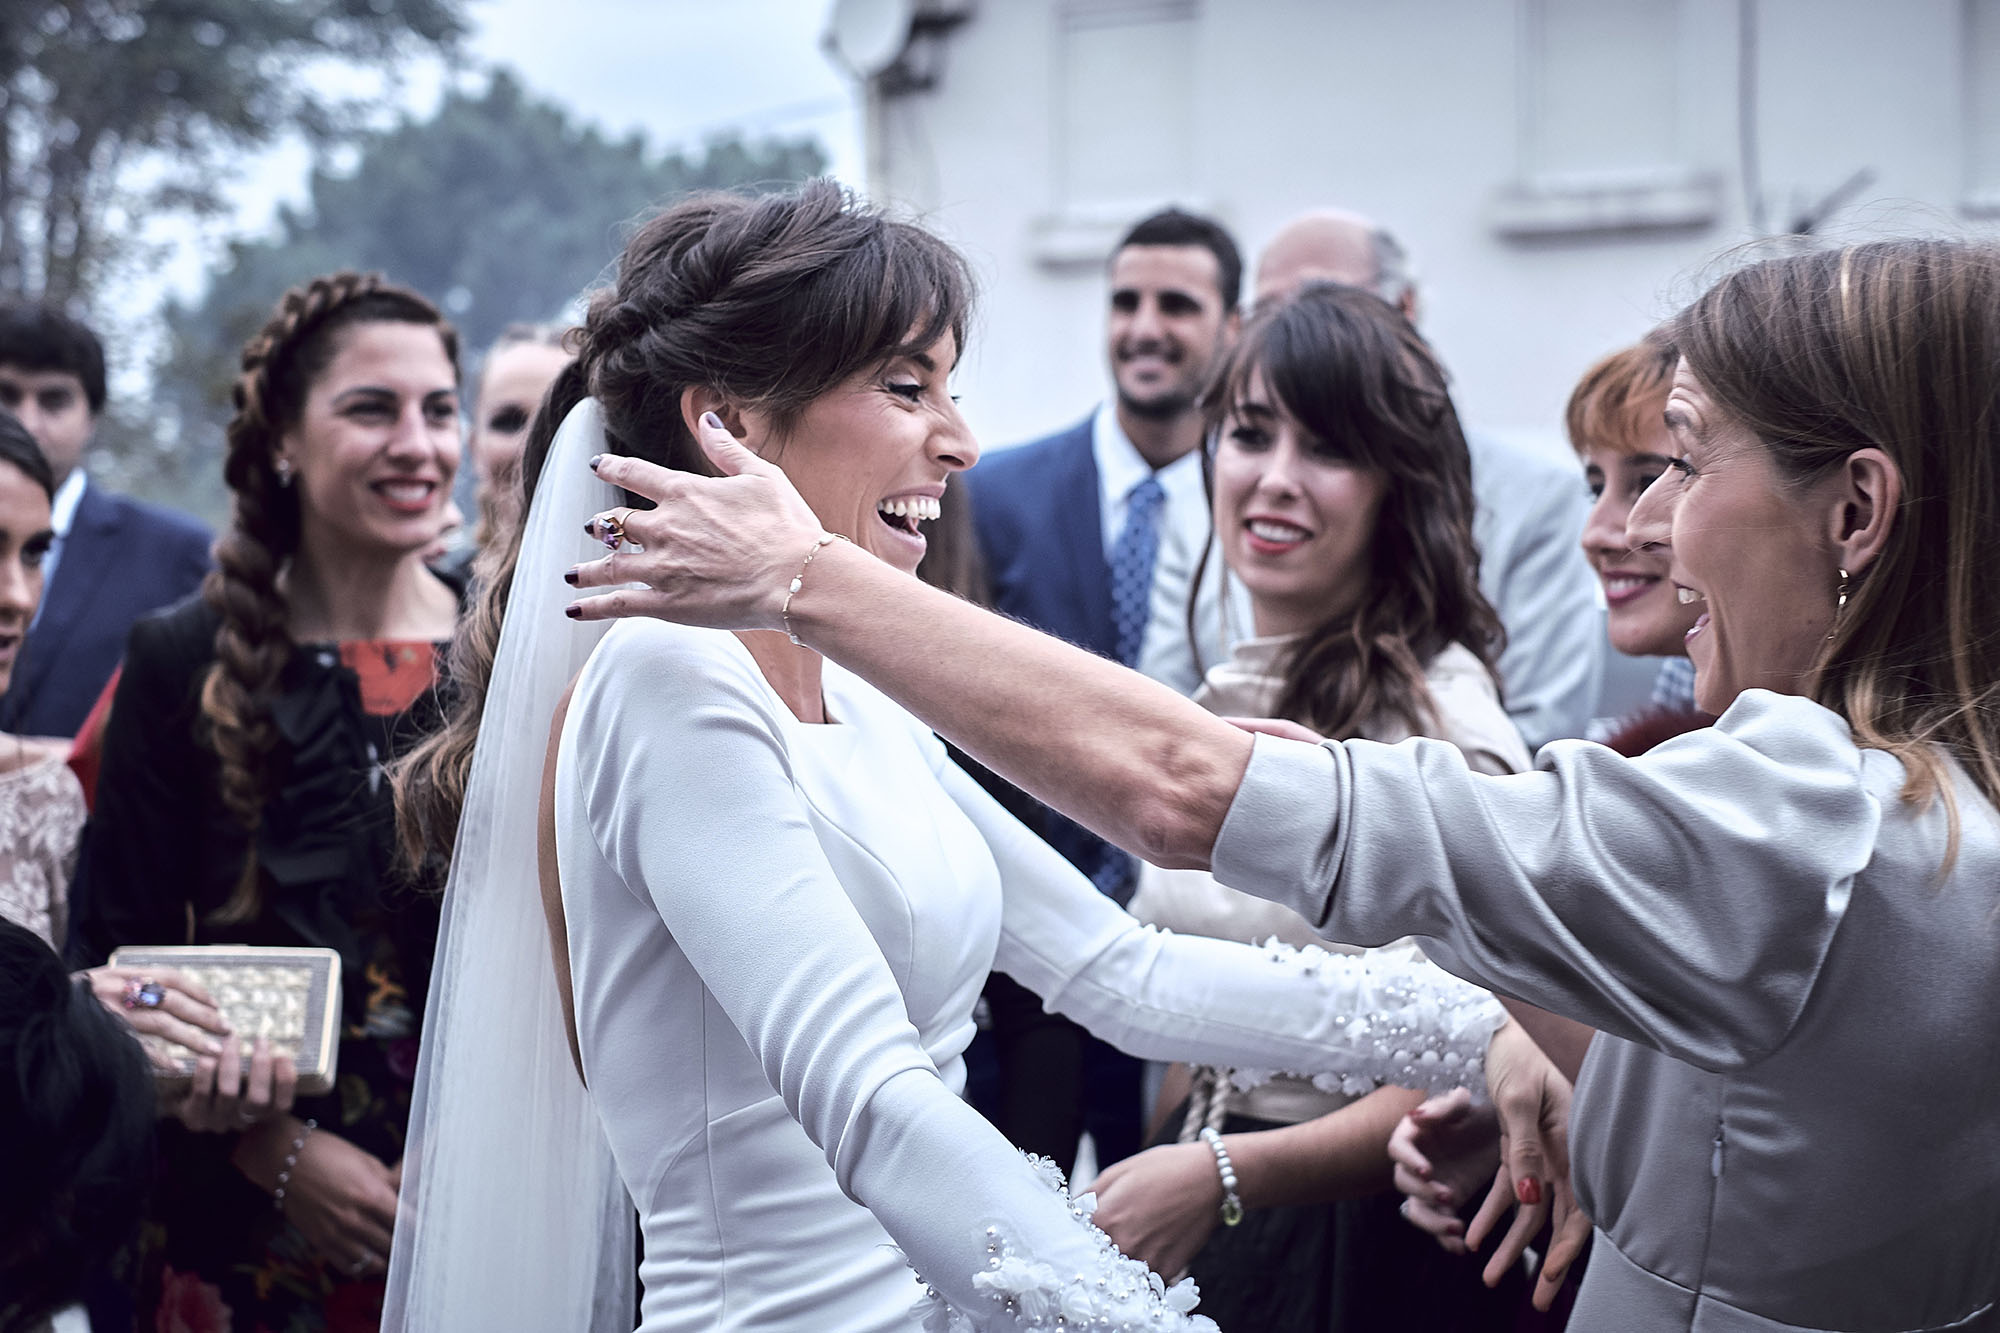 abrazo de la novia con amiga